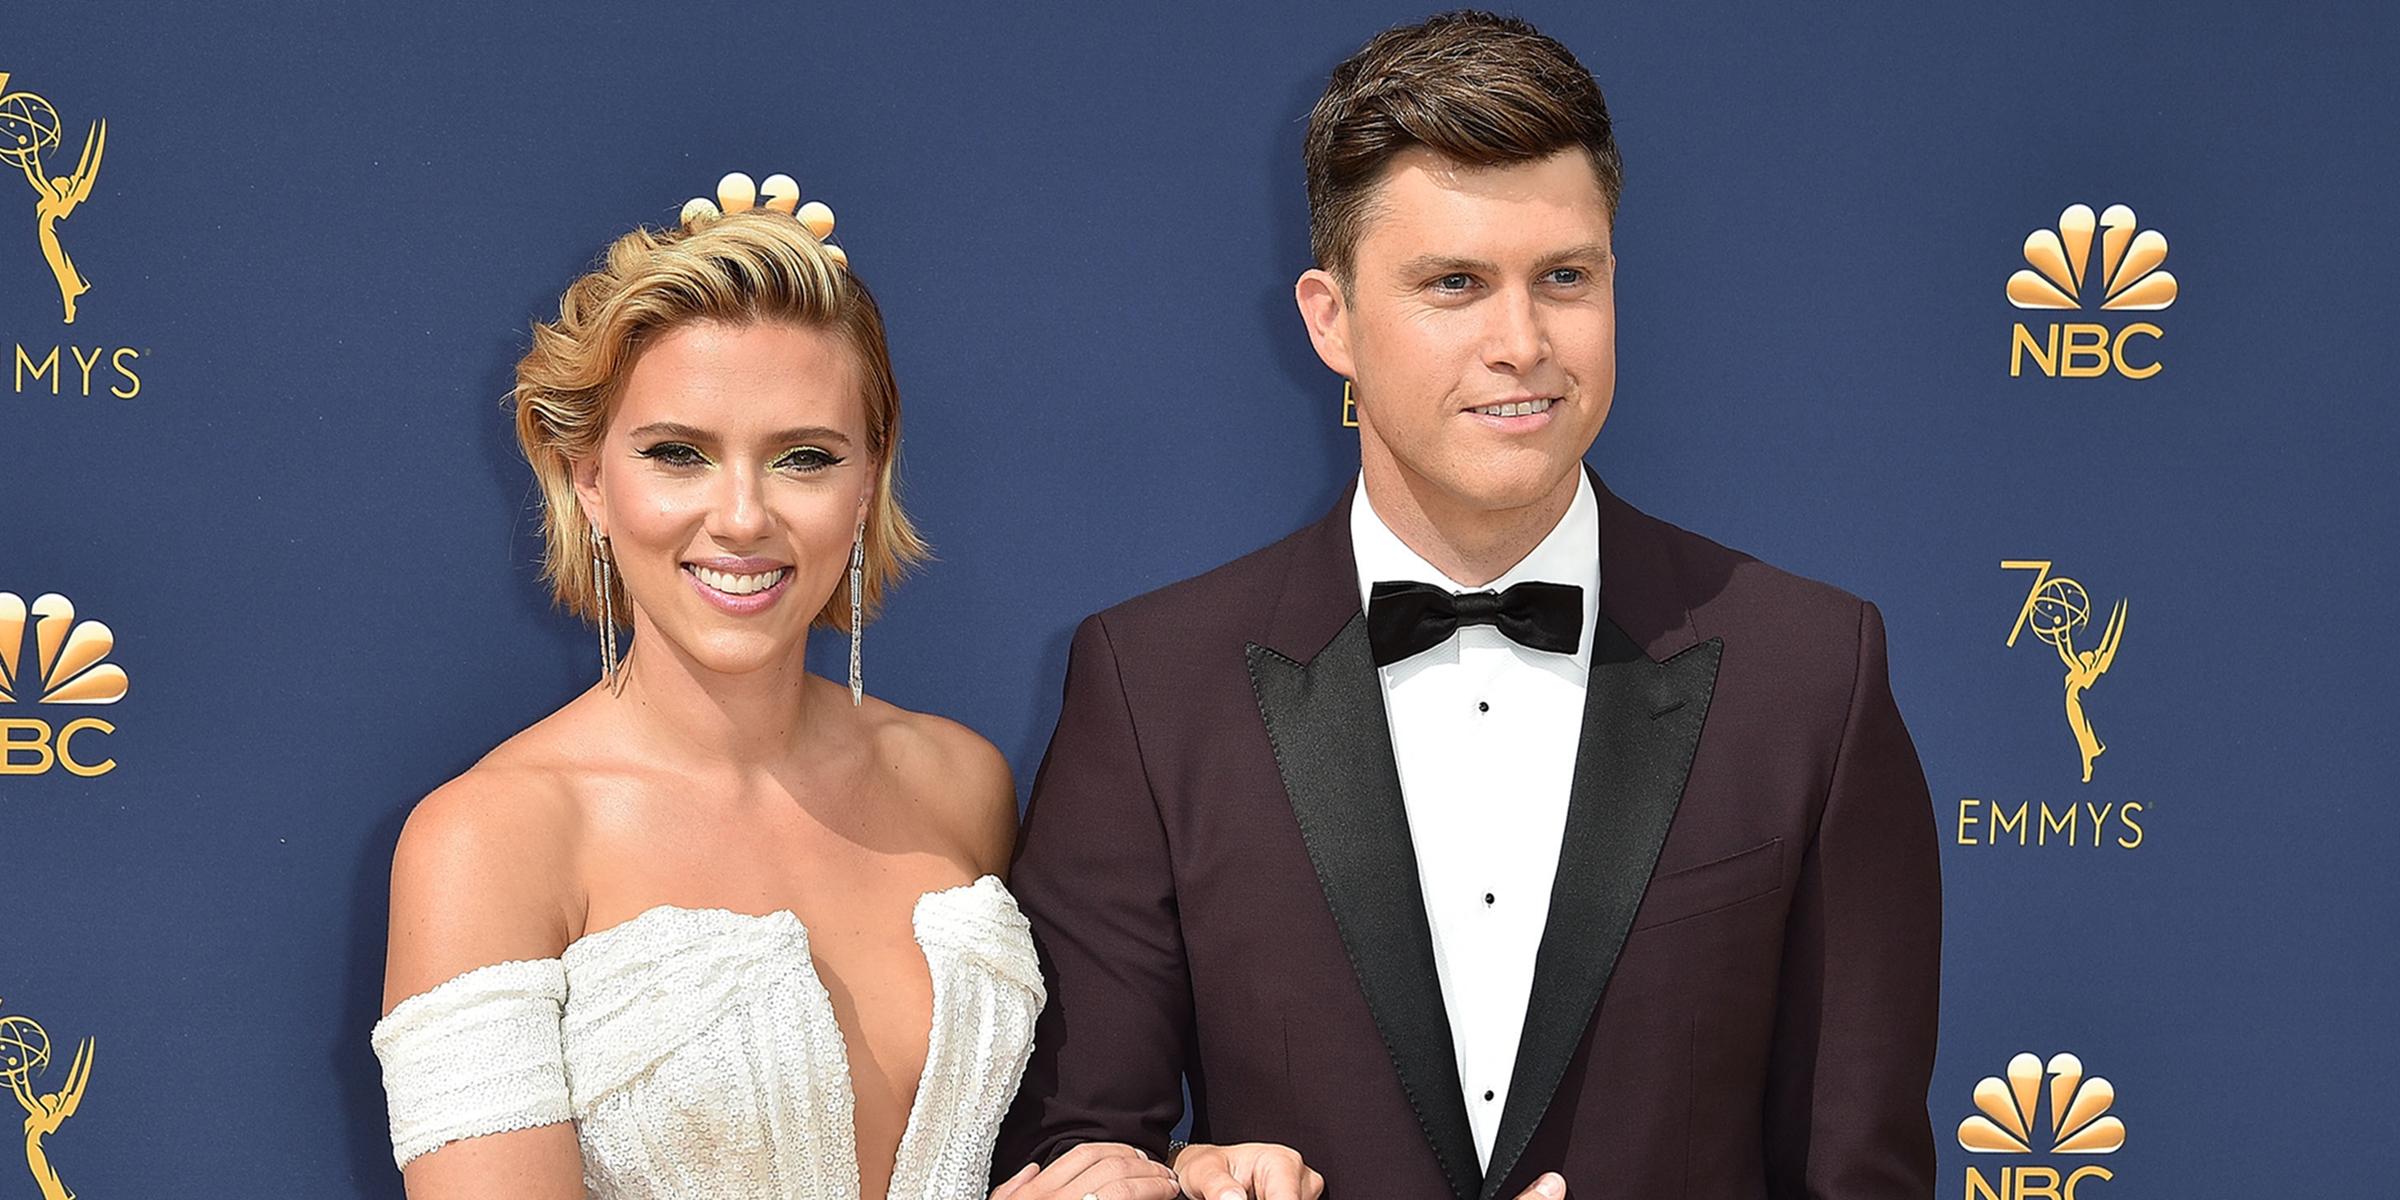 Scarlett Johansson And Saturday Night Live Star Colin Jost Are Engaged